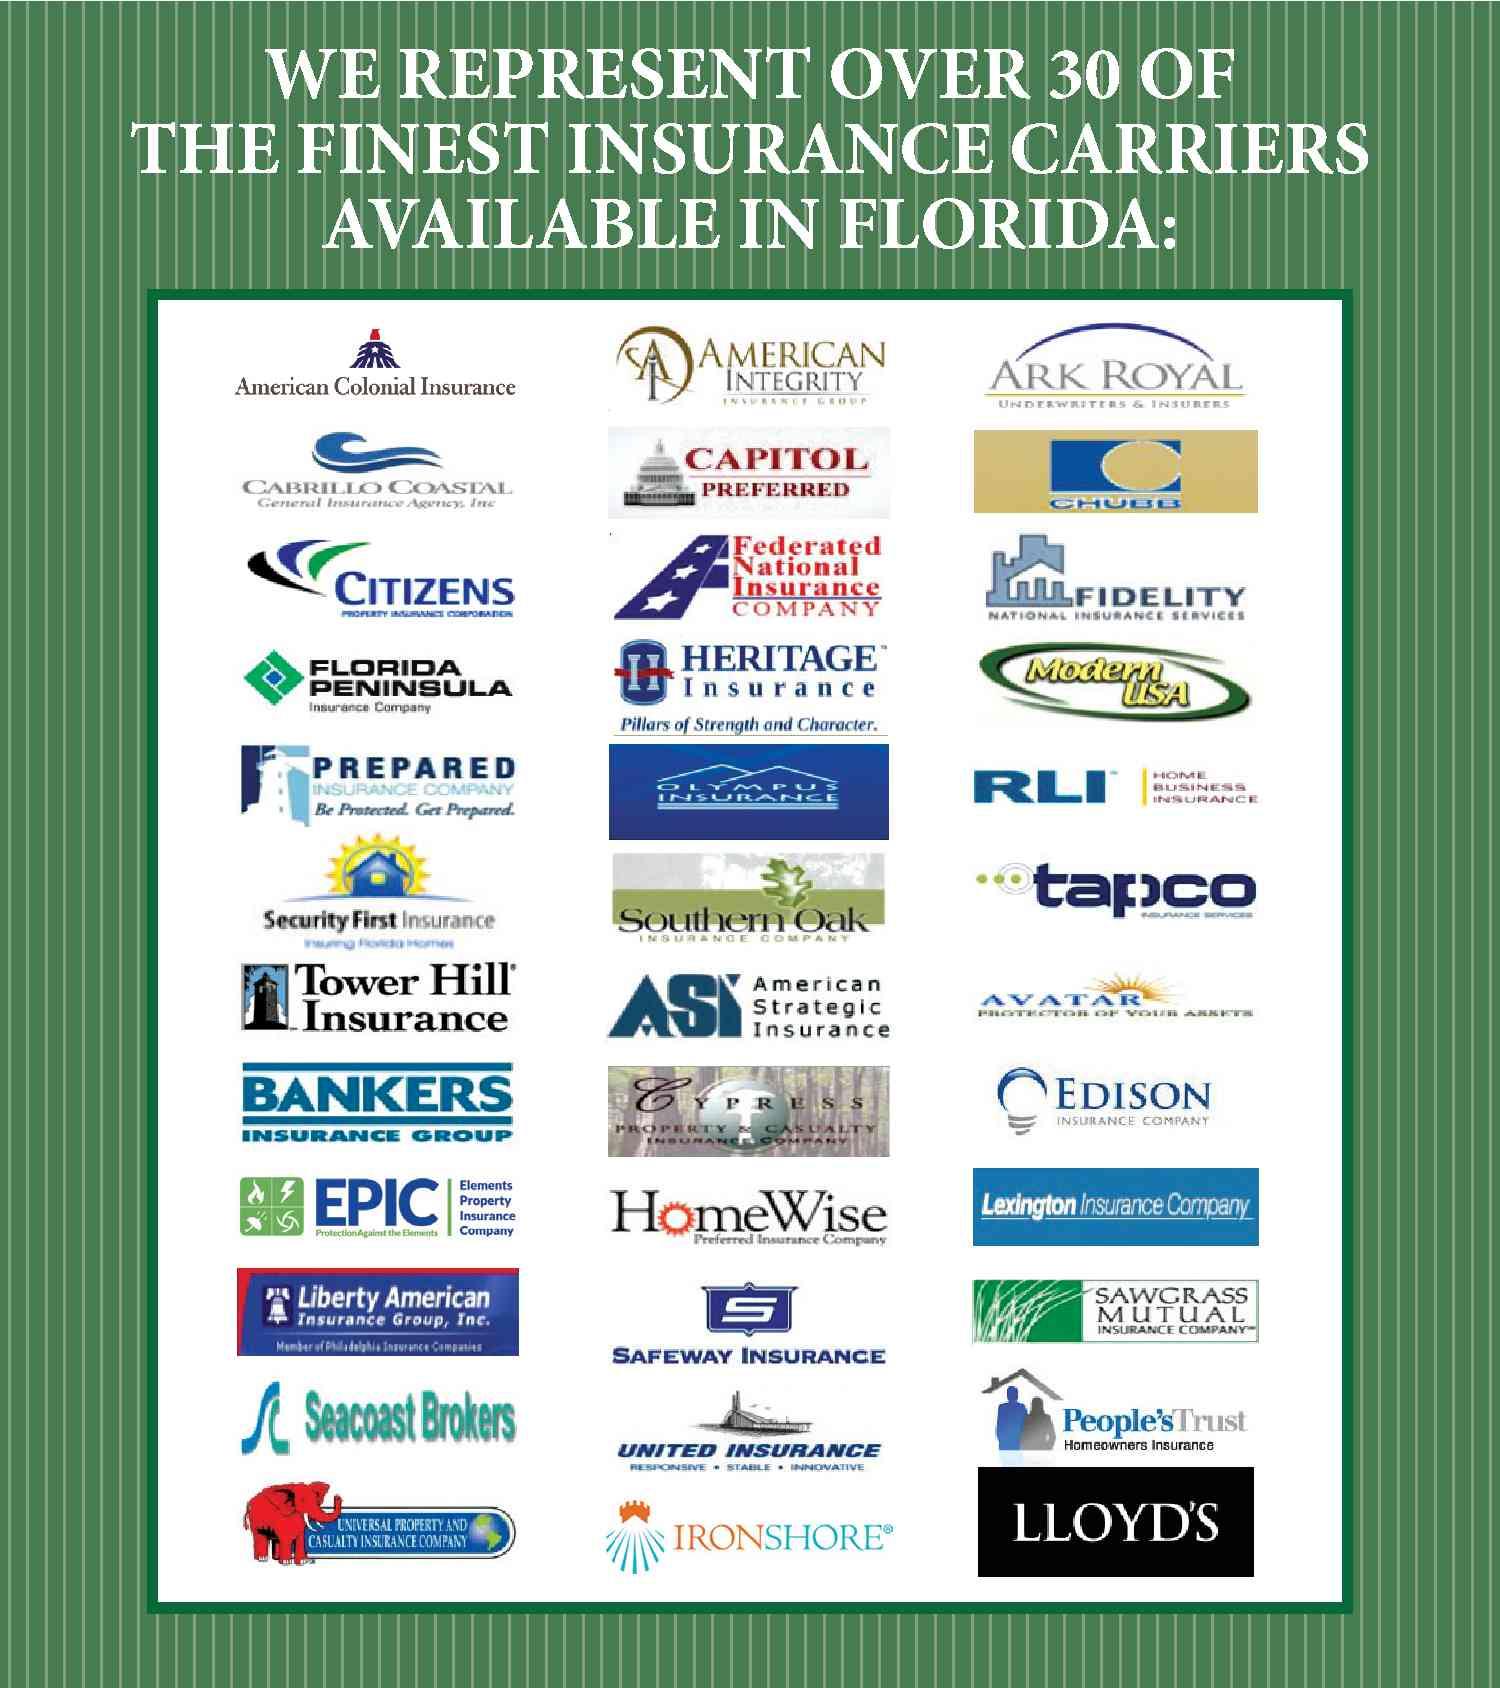 Citizens Insurance Quote Cape Coral Home Insurance  The Insurancenter